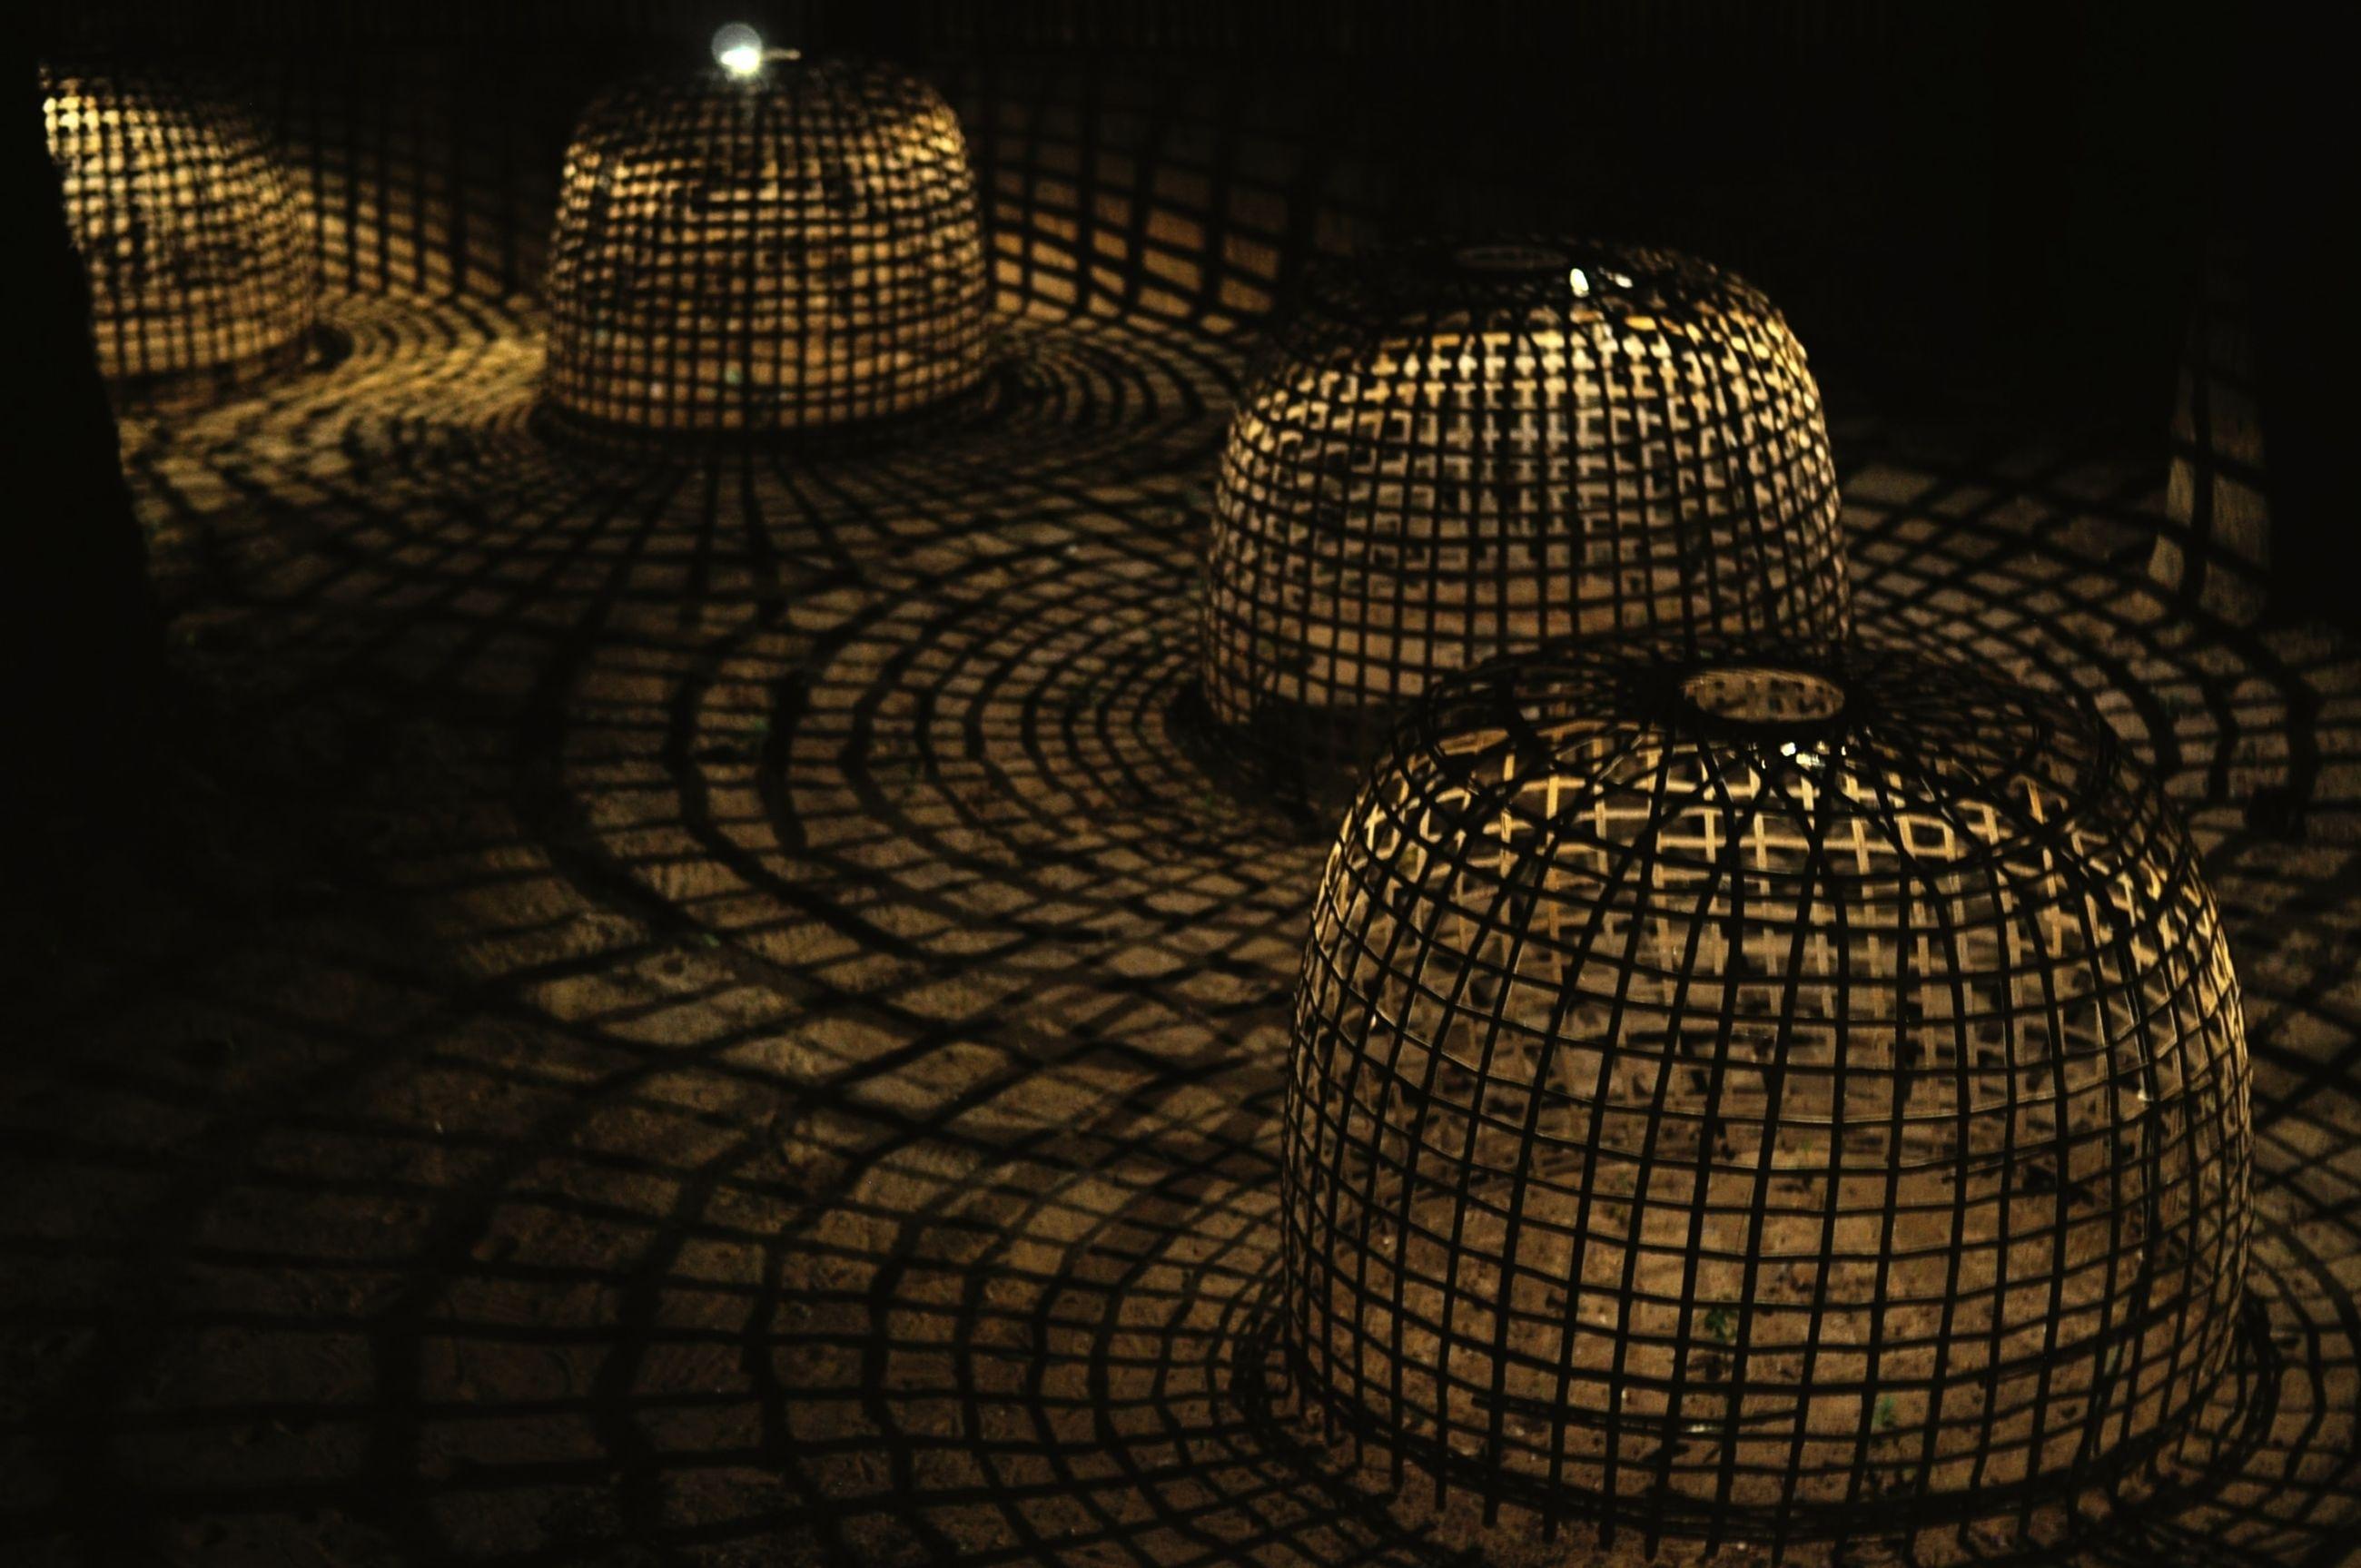 darkness, lighting, no people, light, pattern, night, illuminated, architecture, circle, reflection, indoors